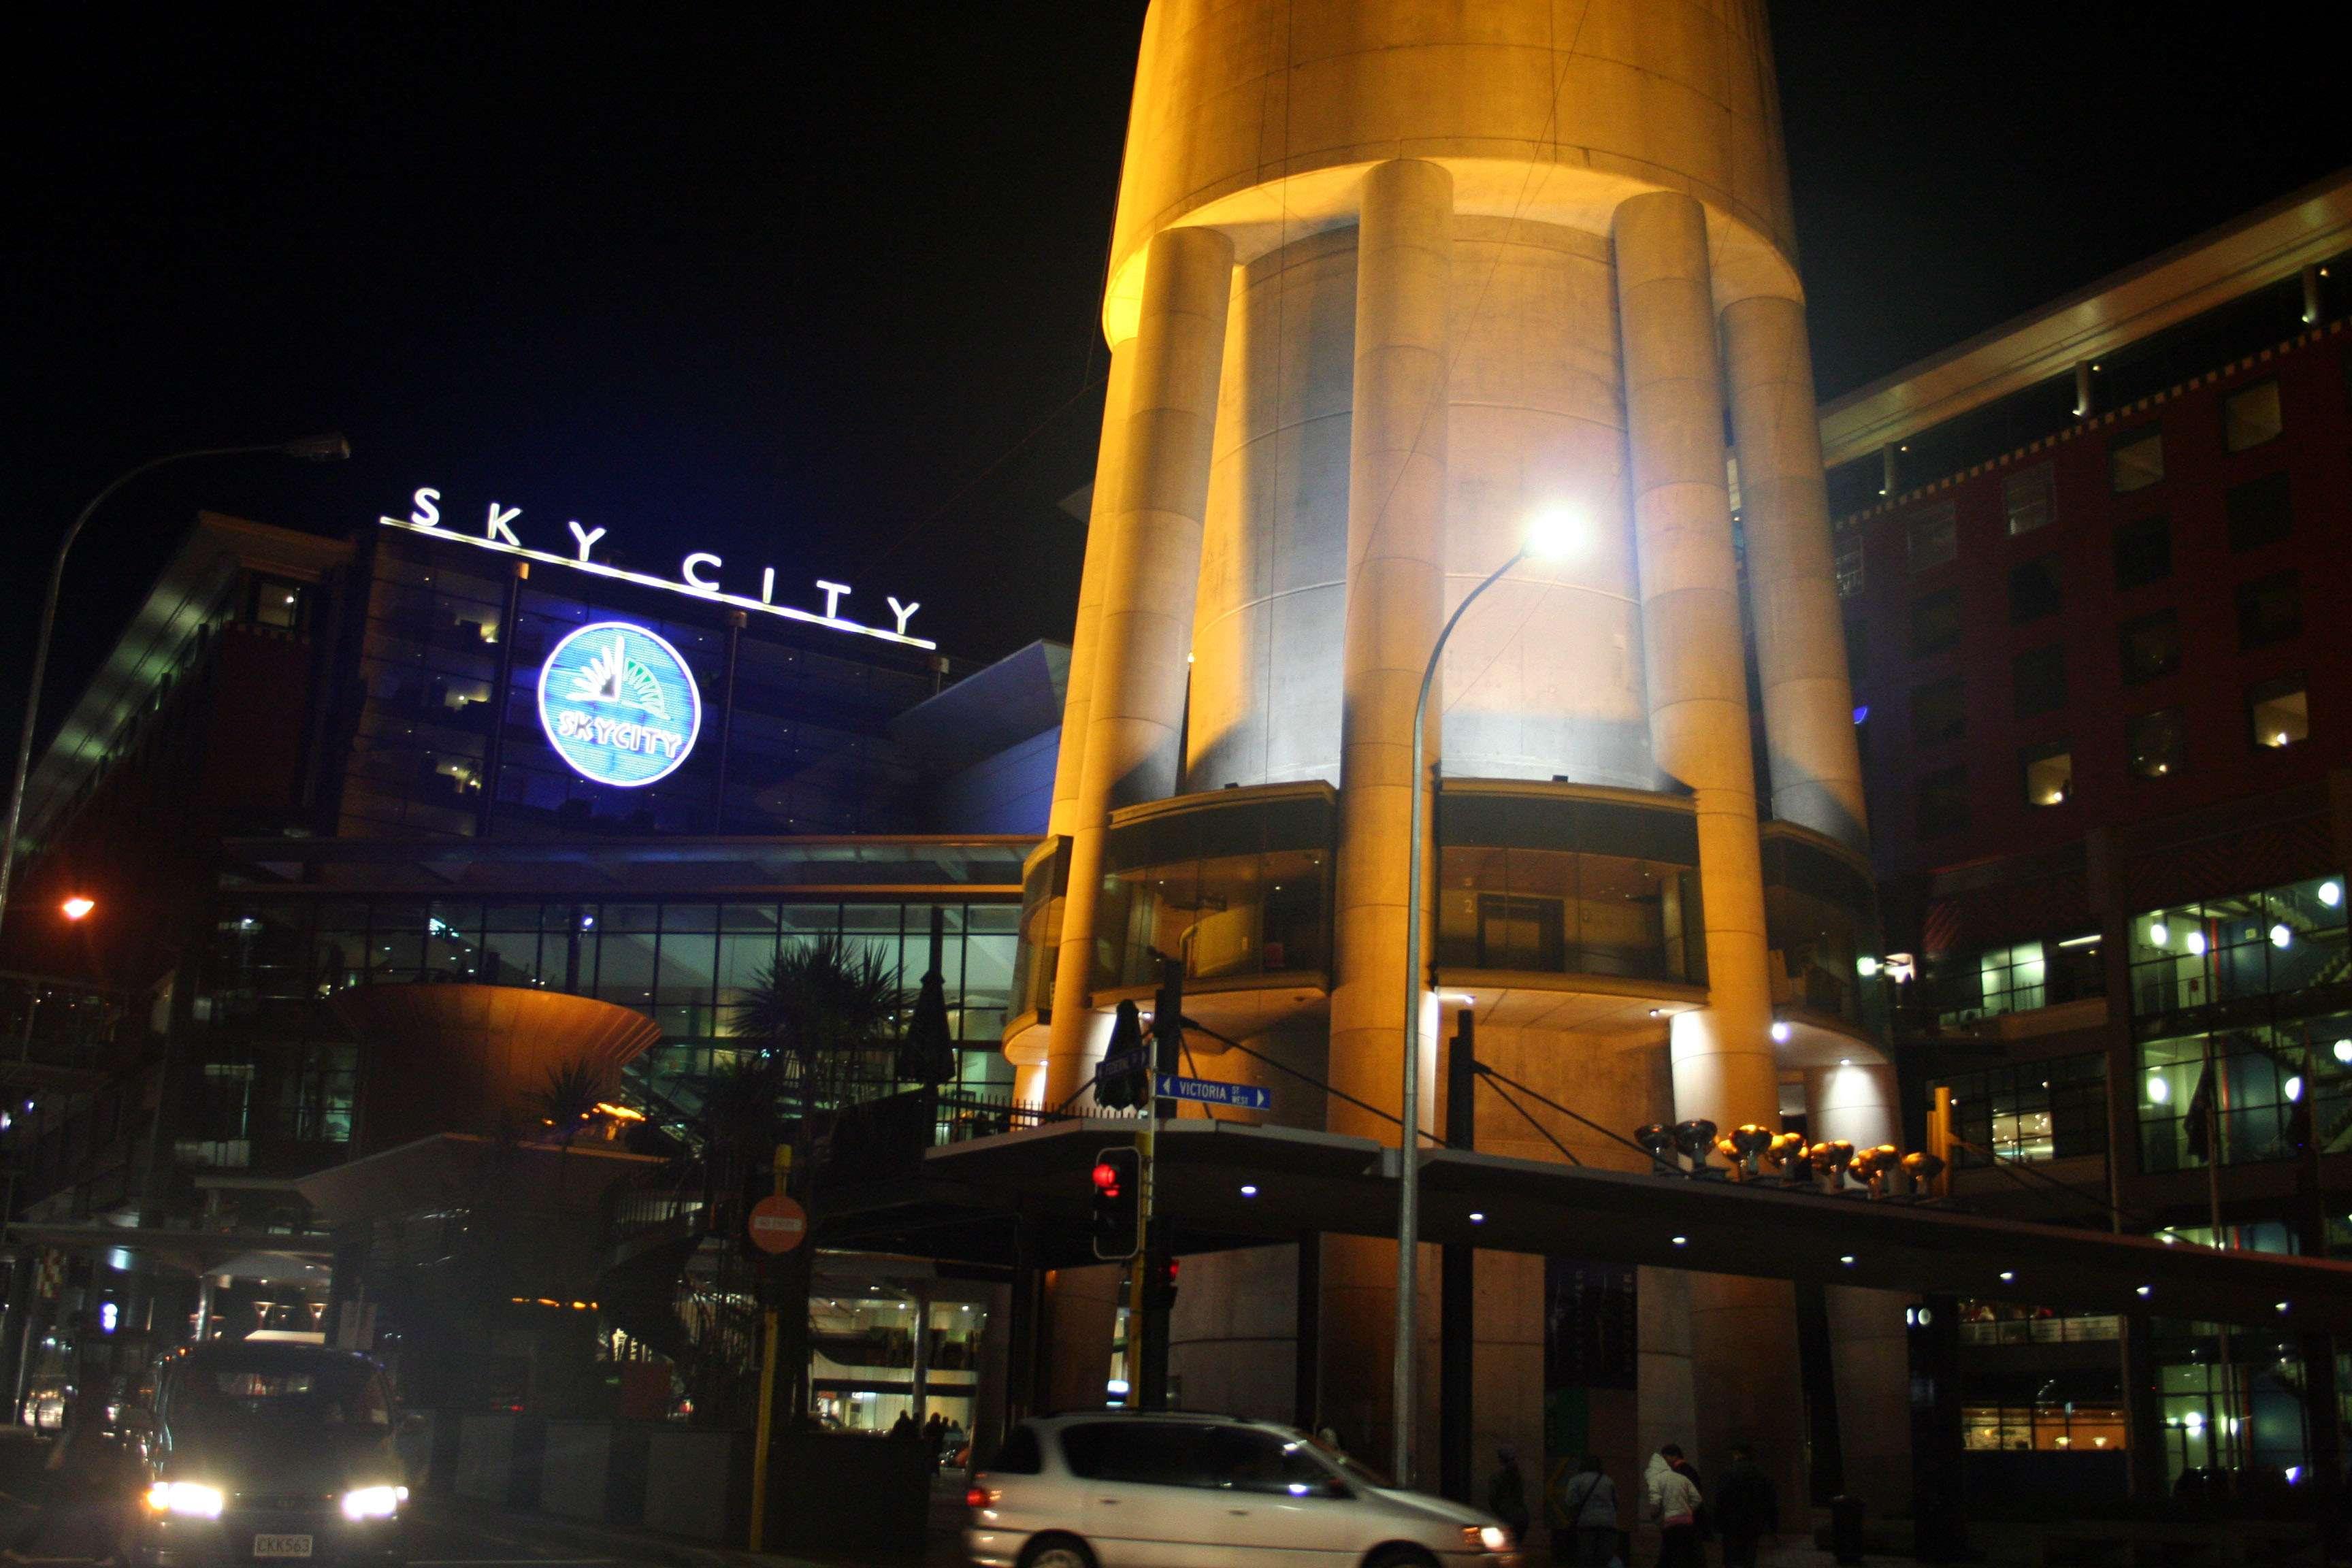 Skycity-Hamilton-review